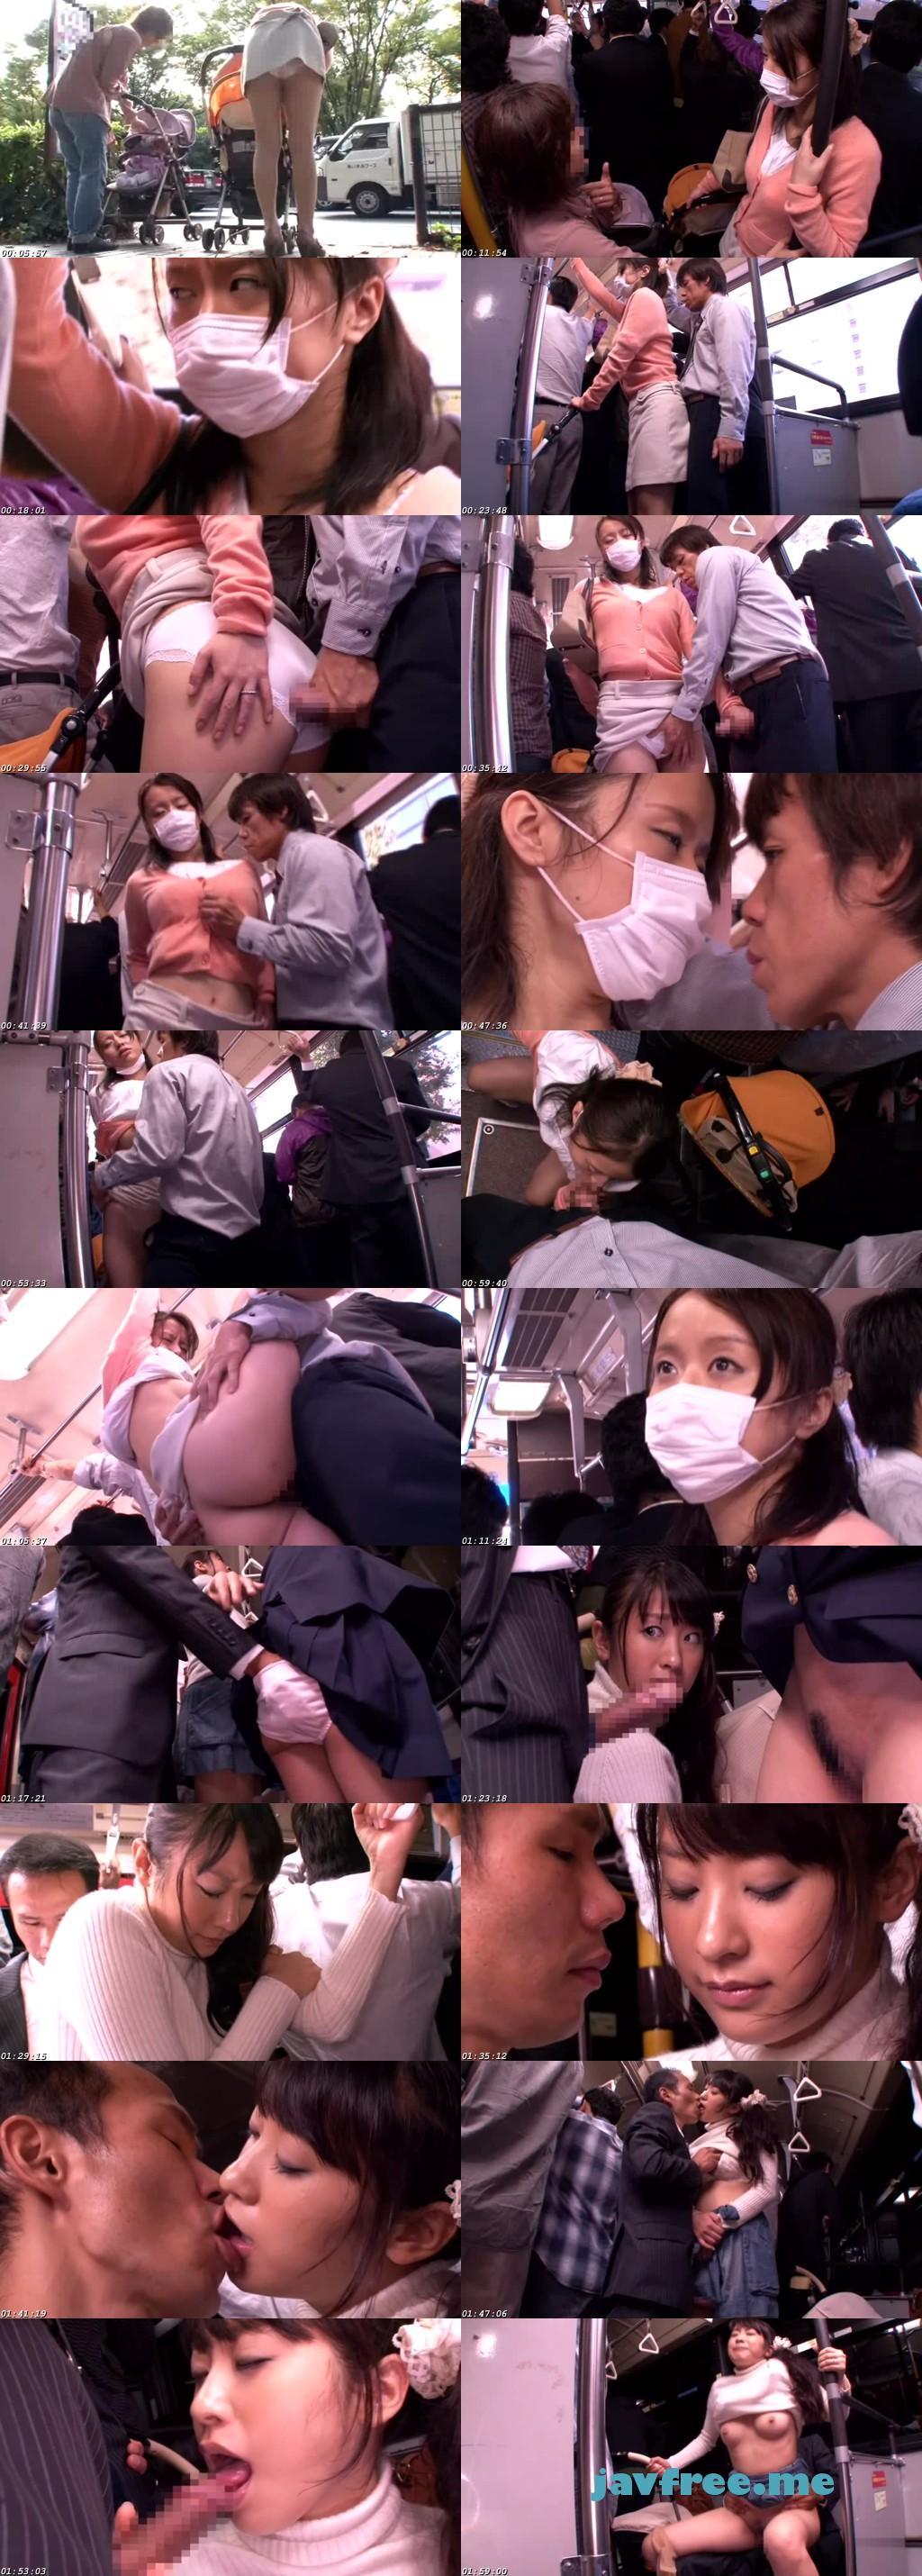 [DANDY 309] 「路線バスでベビーカー妻のミニスカ尻に勃起チ○ポを擦りつけてヤる」 VOL.1 DANDY